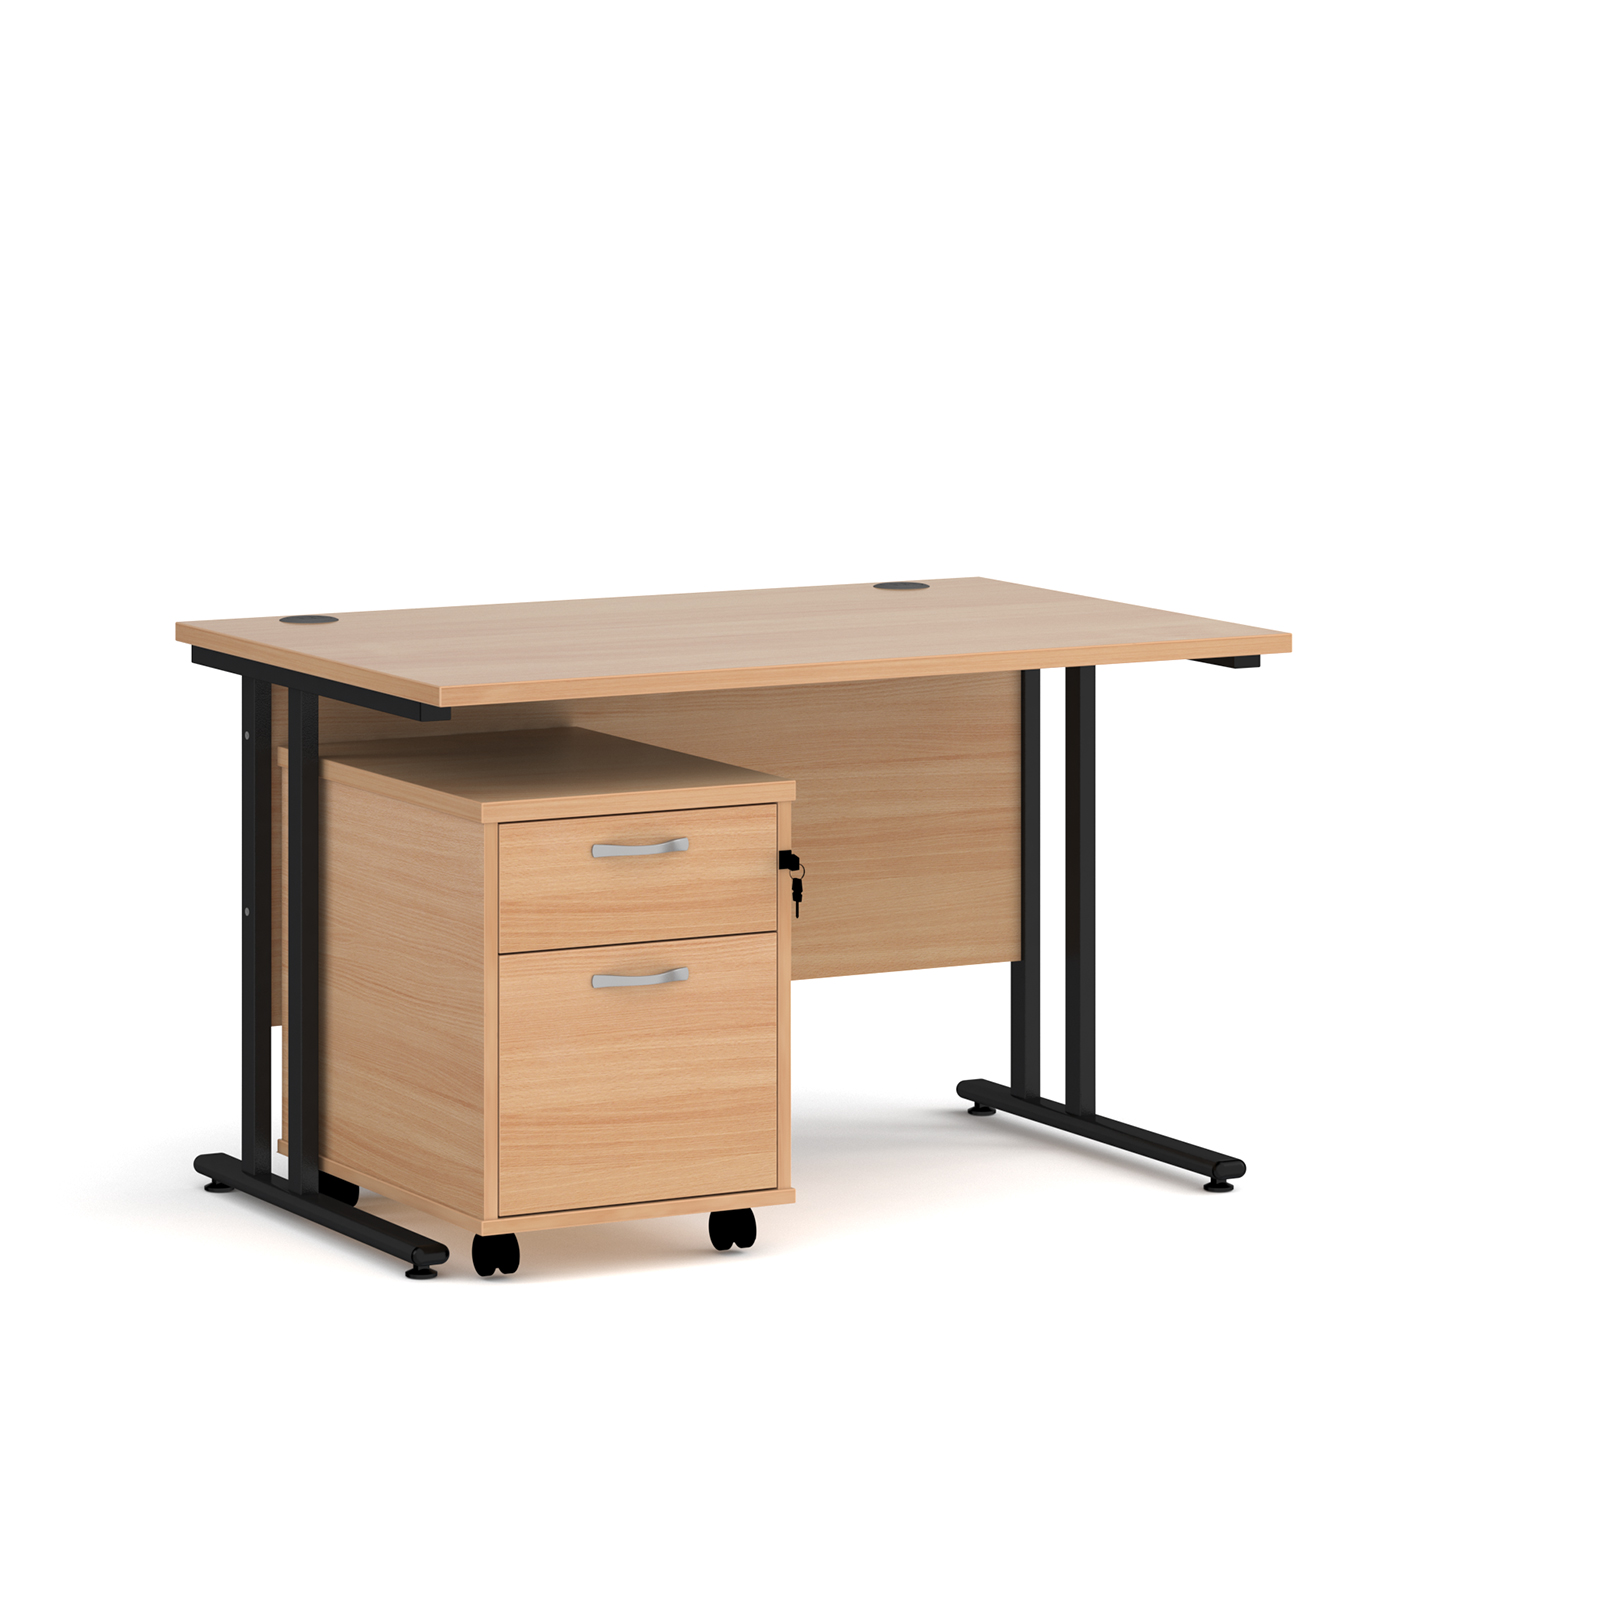 Rectangular Desks Maestro 25 straight desk 1200mm x 800mm with black cantilever frame and 2 drawer pedestal - beech